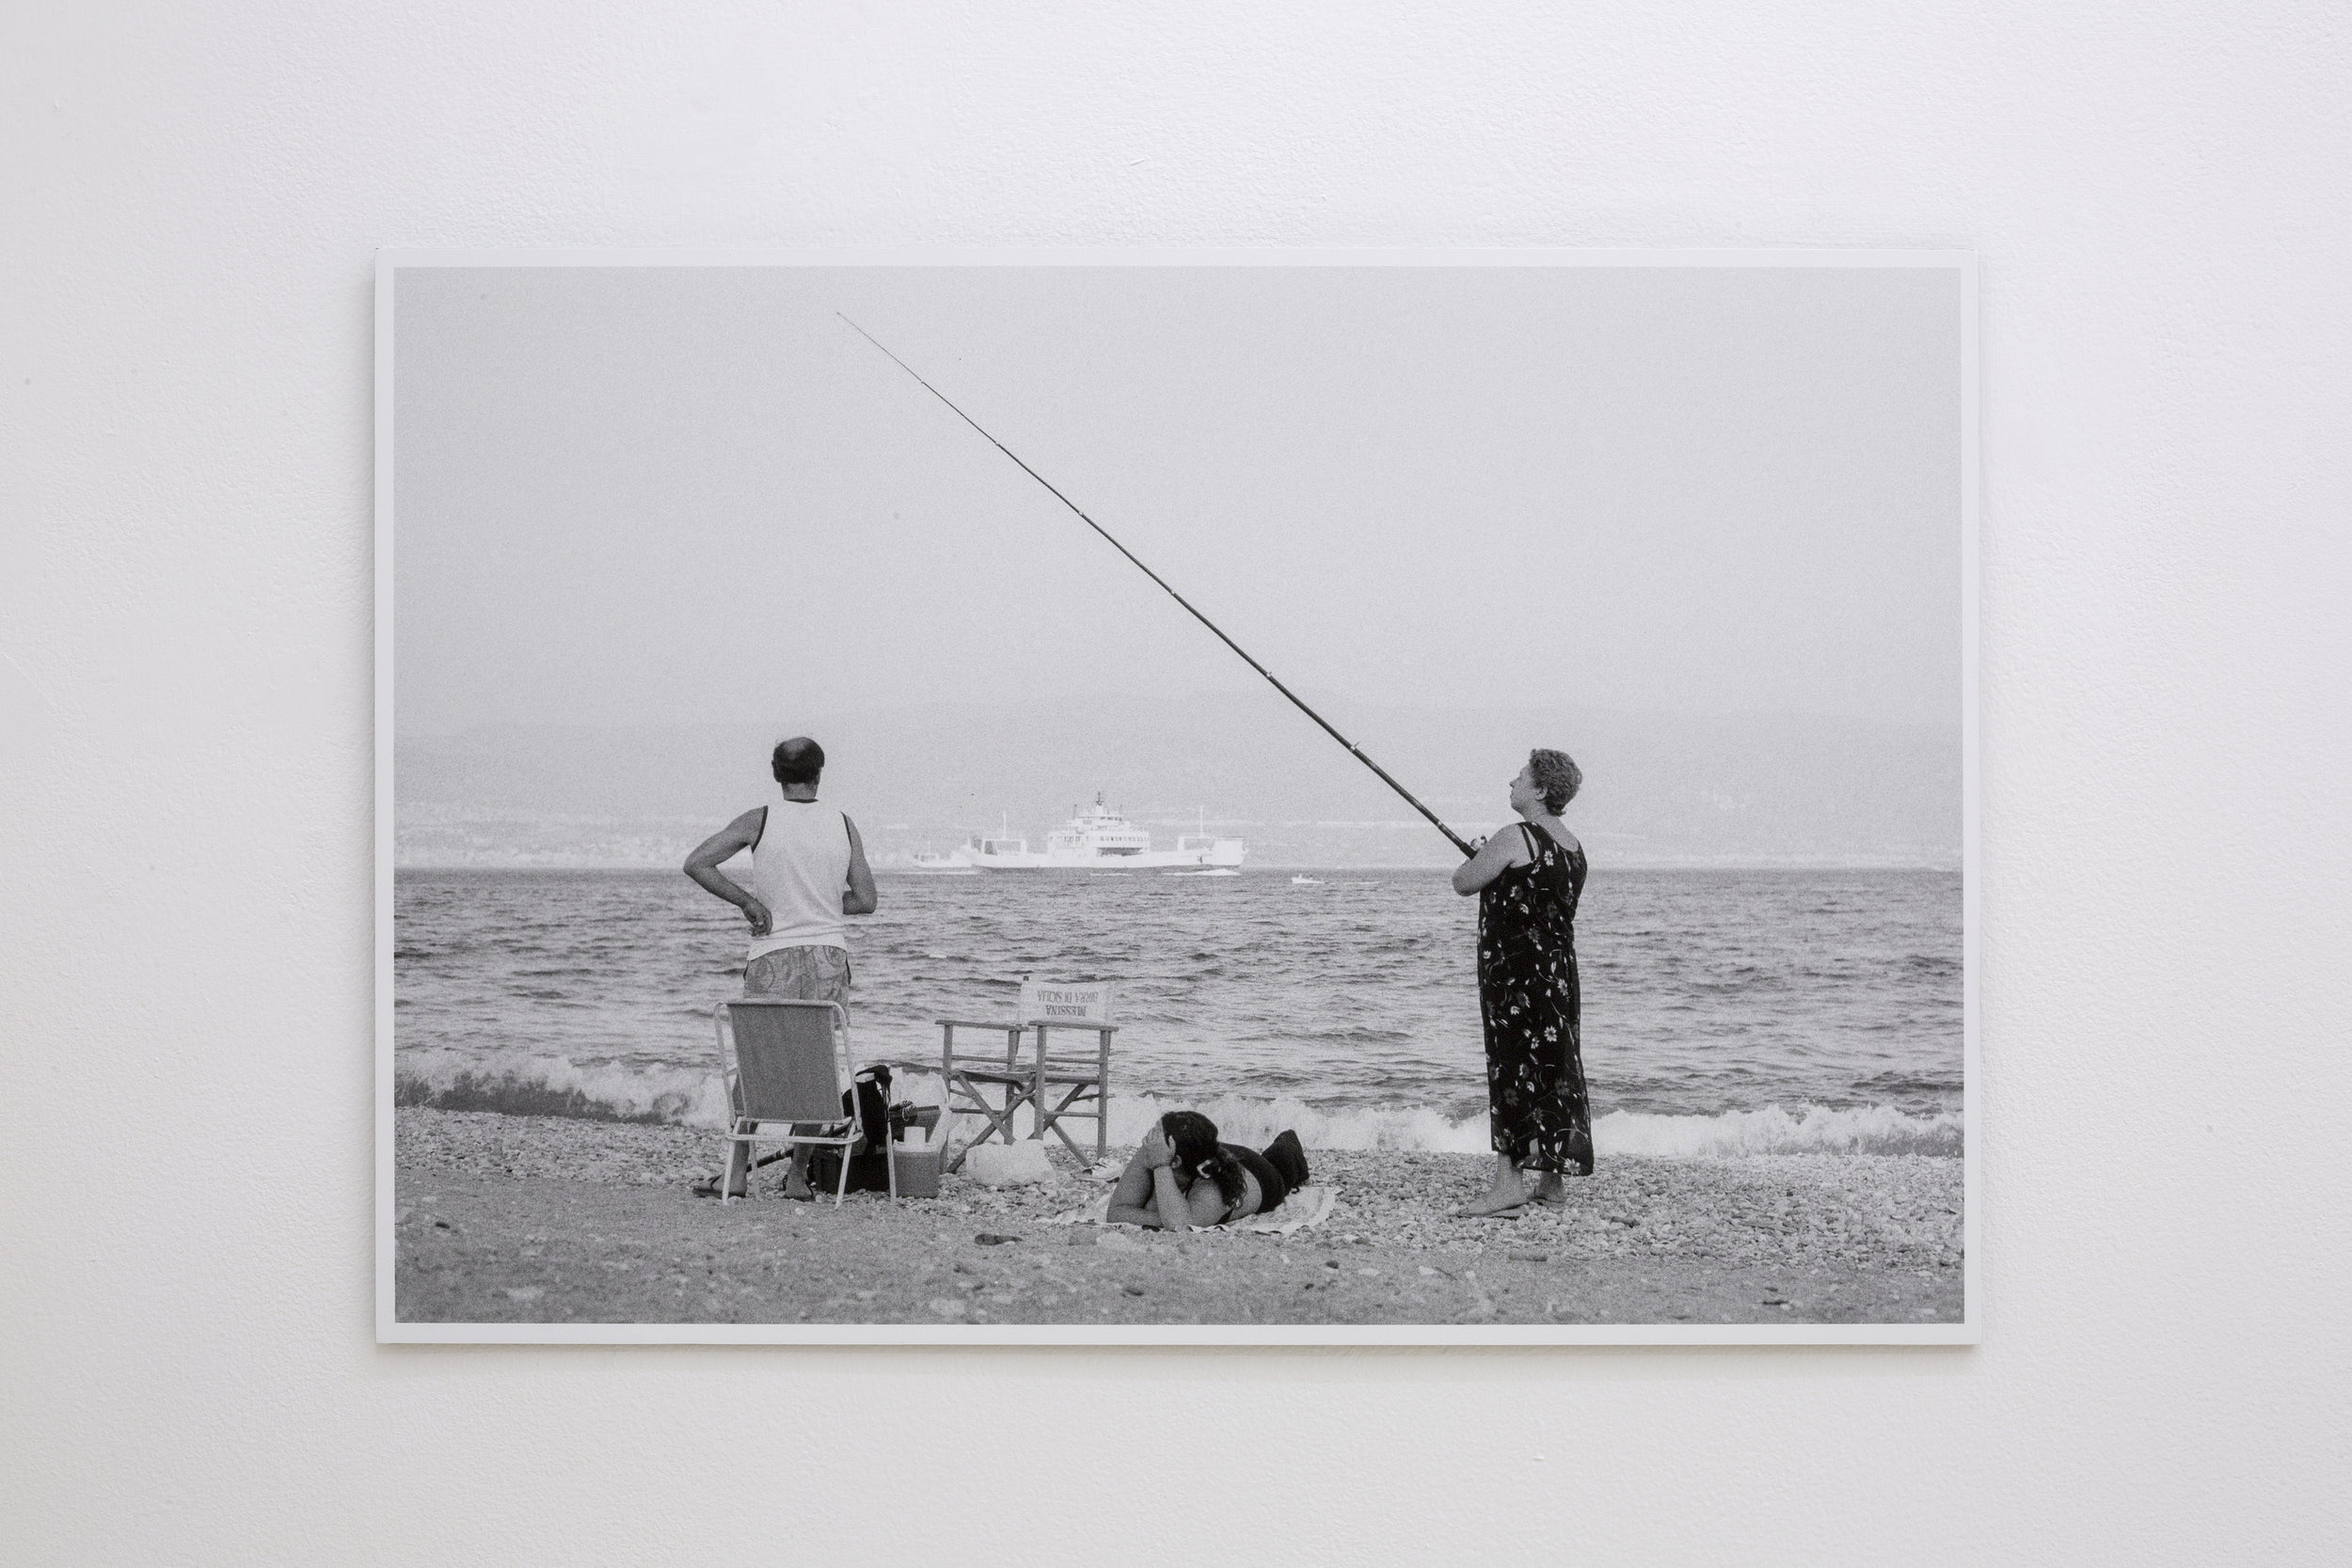 Padraig Timoney Messina Family , 2004 - 2018. Unique archival pigment print on dibond, 50.5 x 36 cm (19.88 x 14.17 in.)